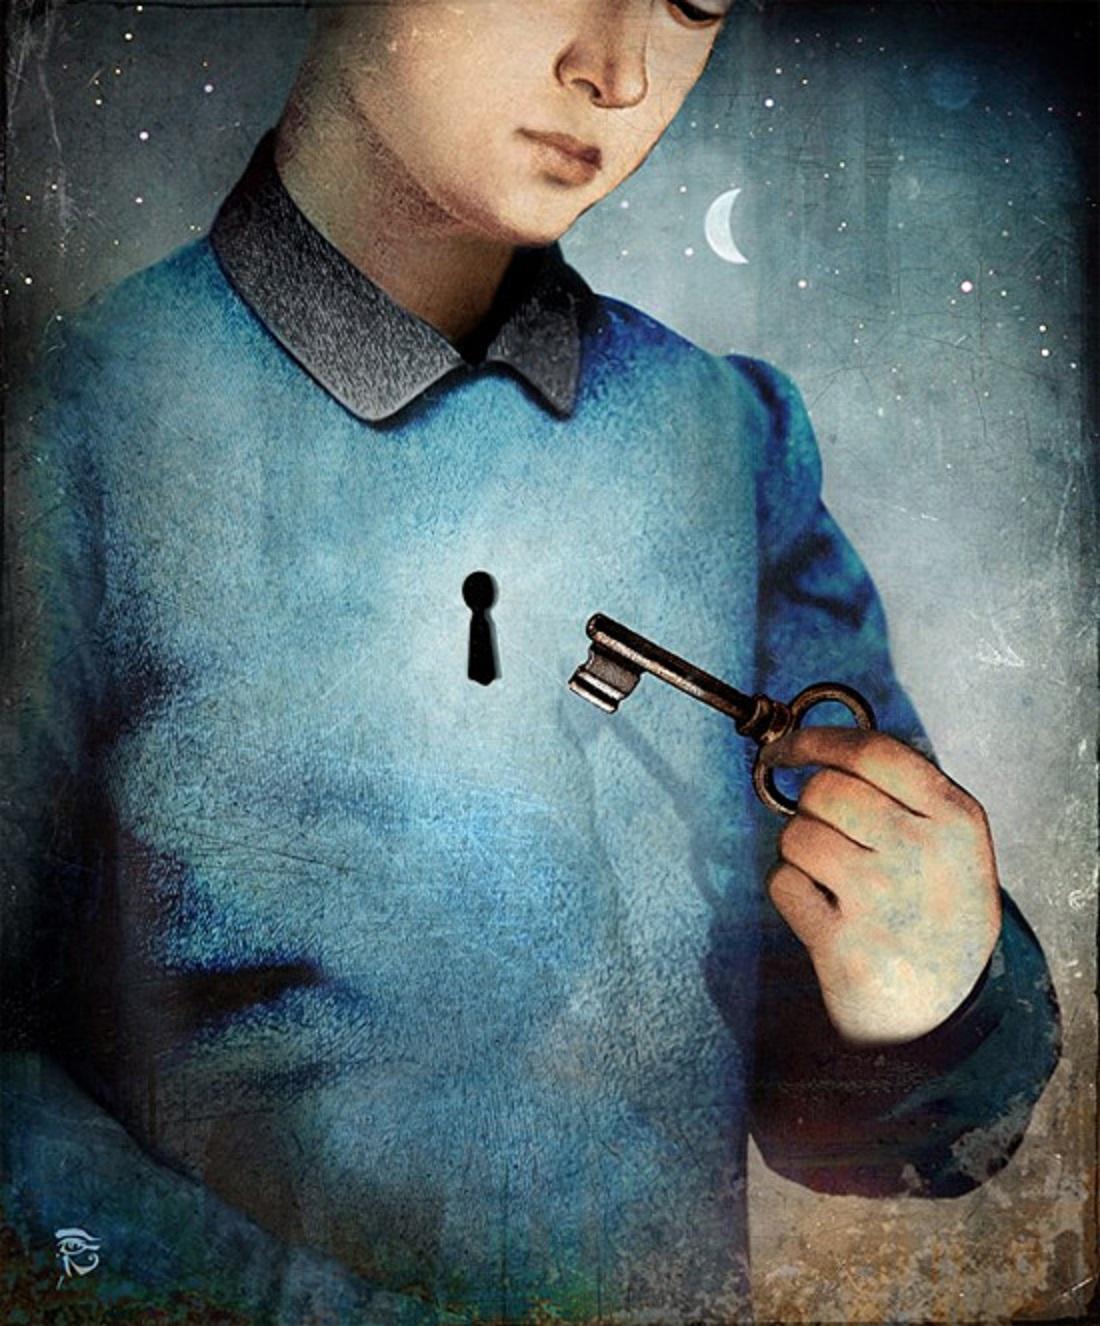 christian-schloe-illustration-01-the-key